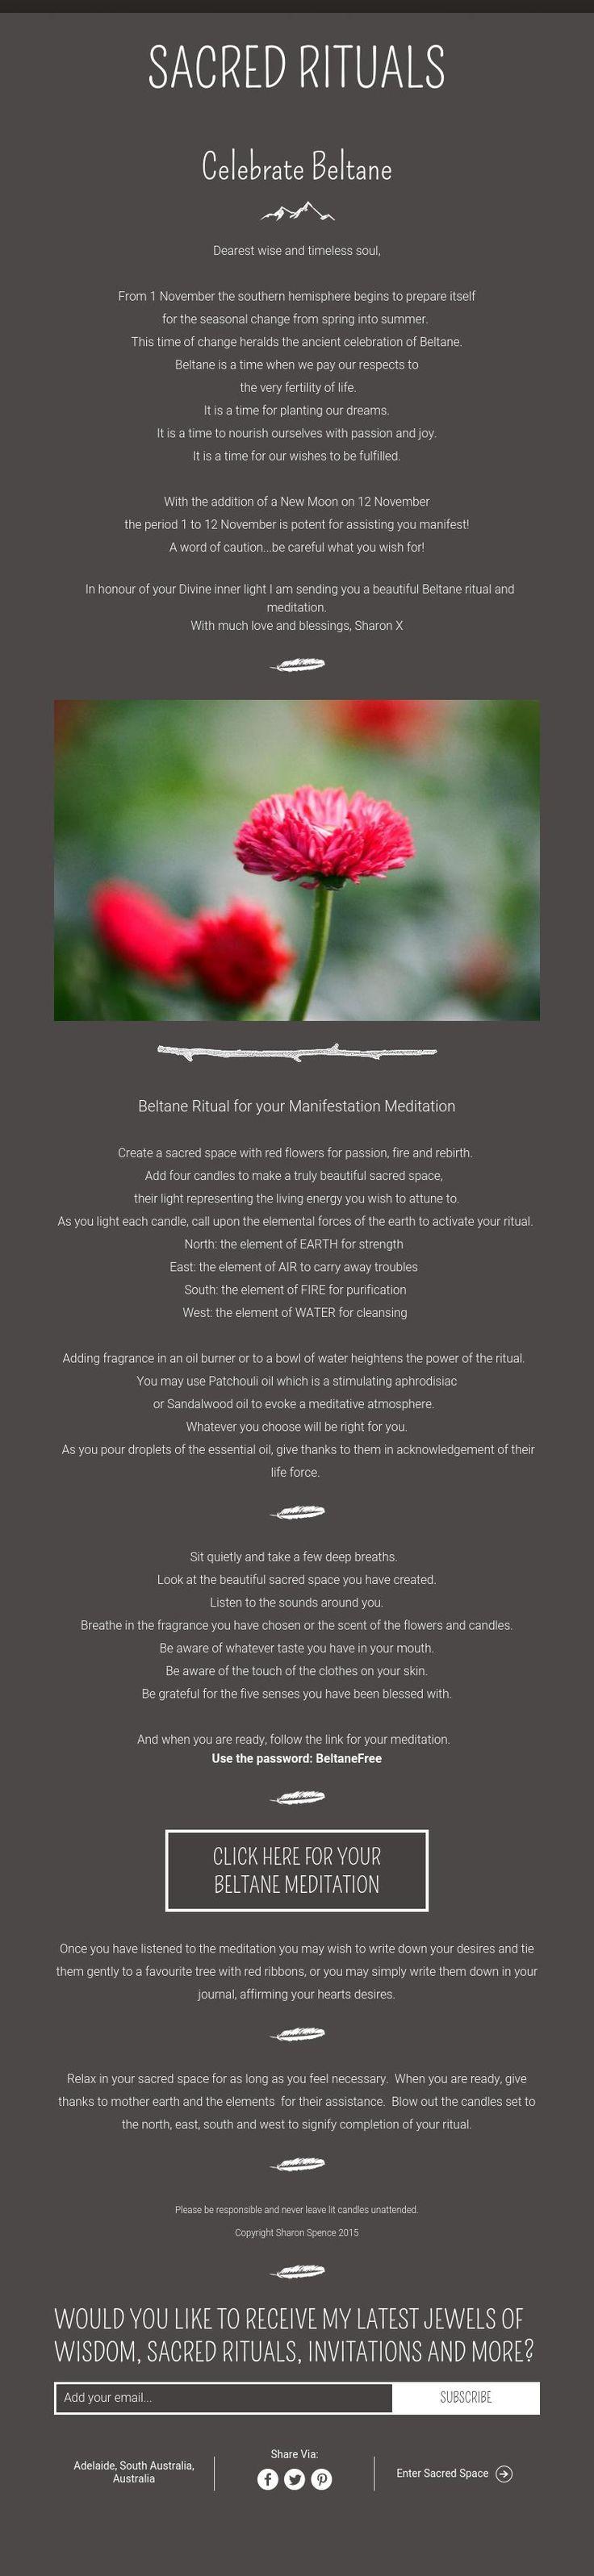 Beltaine: Sacred Rituals ~ Celebrate #Beltane.